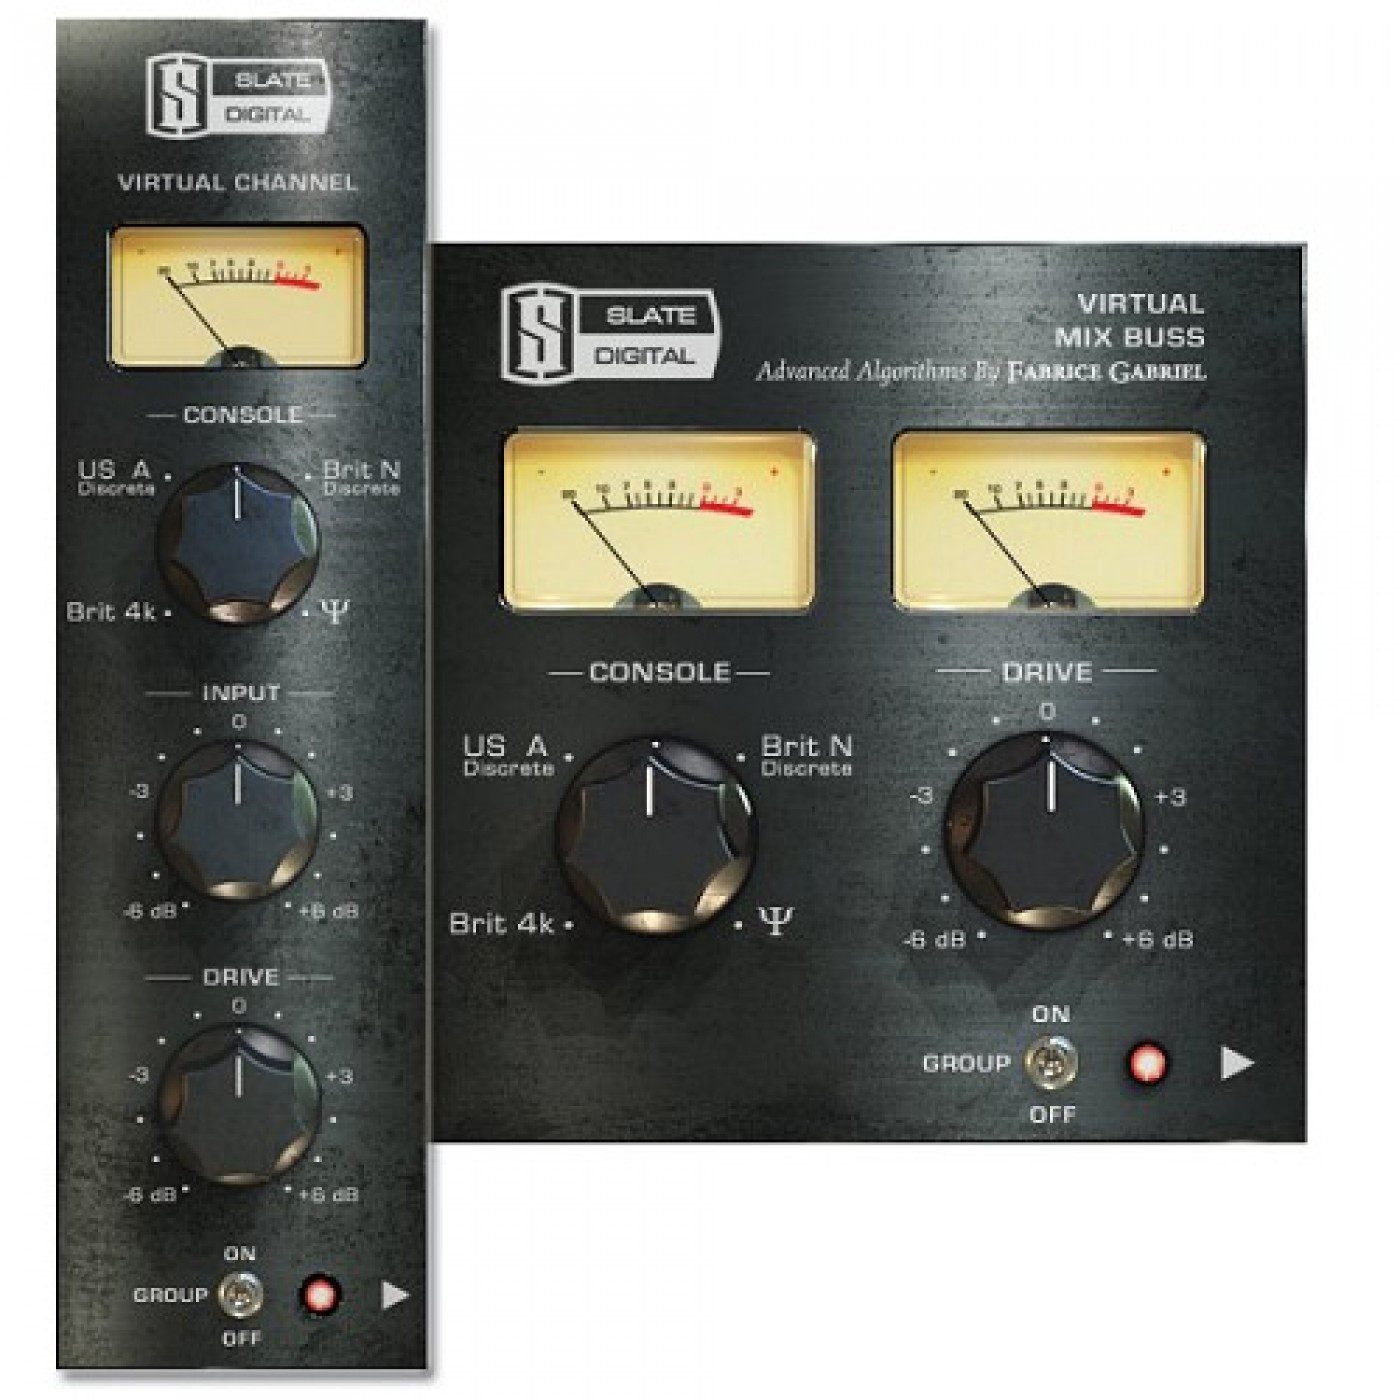 Slate Digital Virtual Console Collection